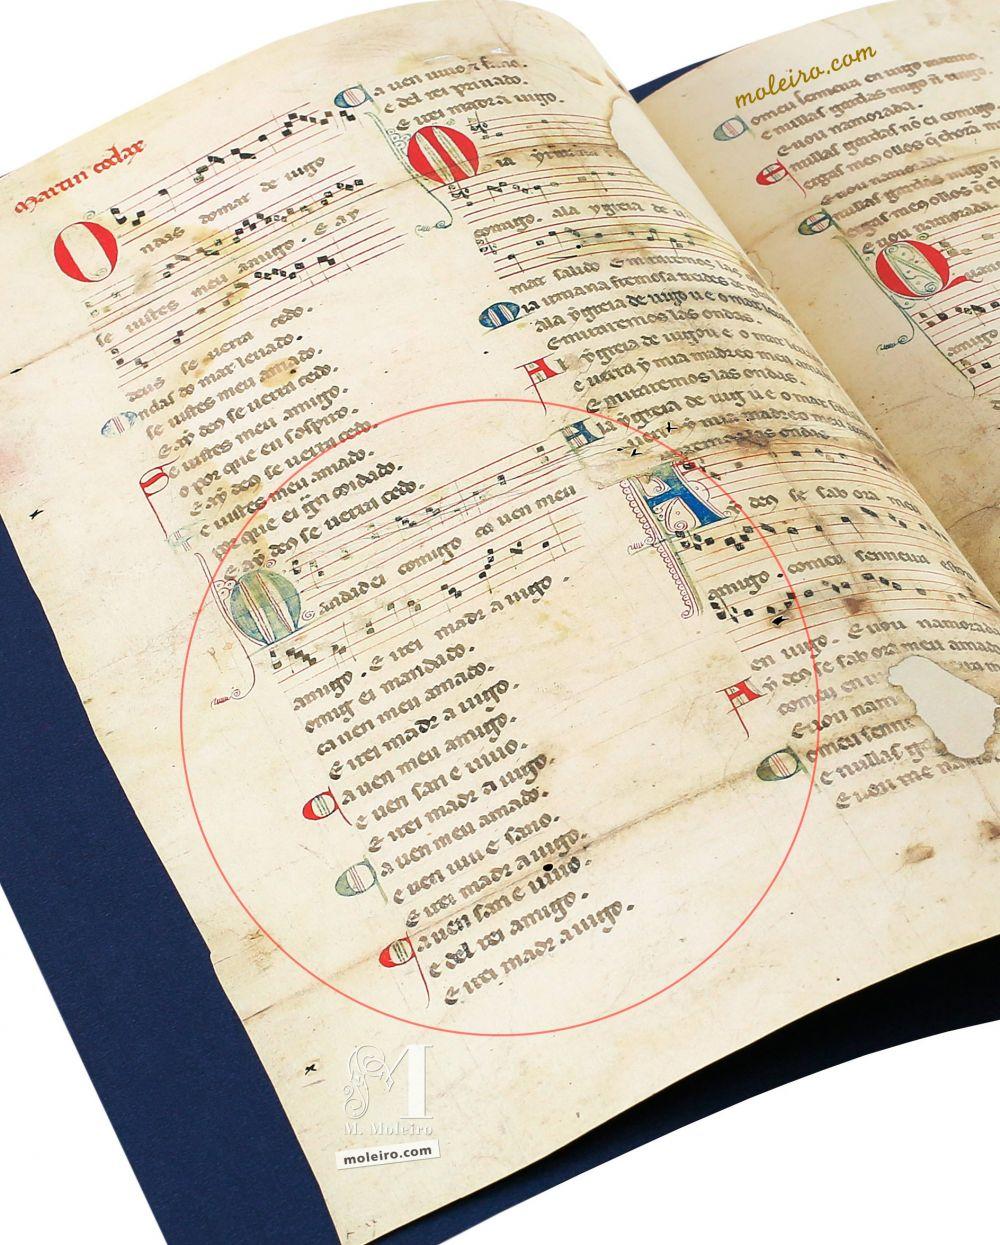 Cantiga 2 Vindel Pergament Martin Codax - The Morgan Library & Museum, Nueva York